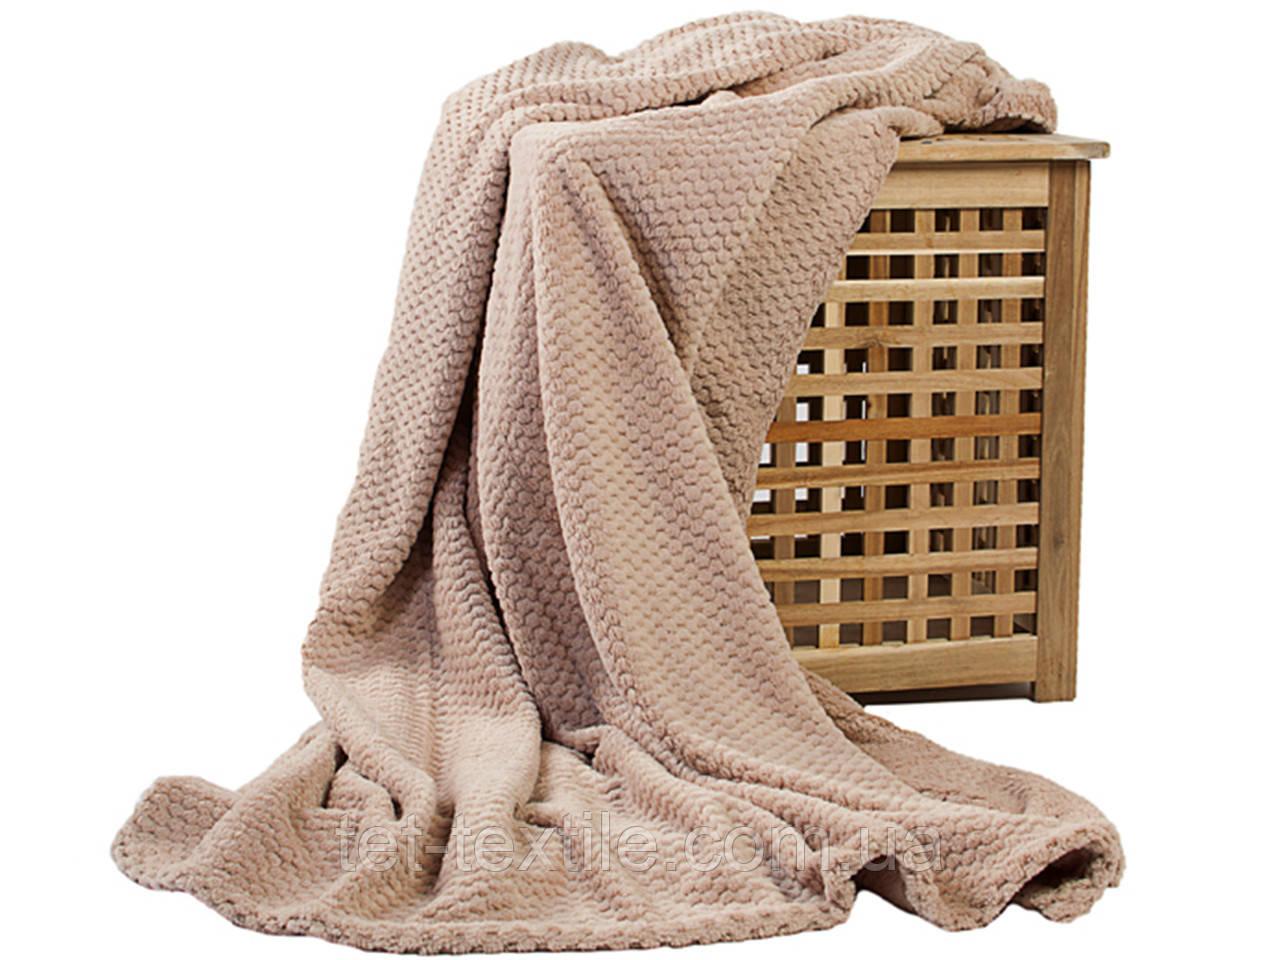 Плед из бамбукового волокна Koloco бежевый (180х220)